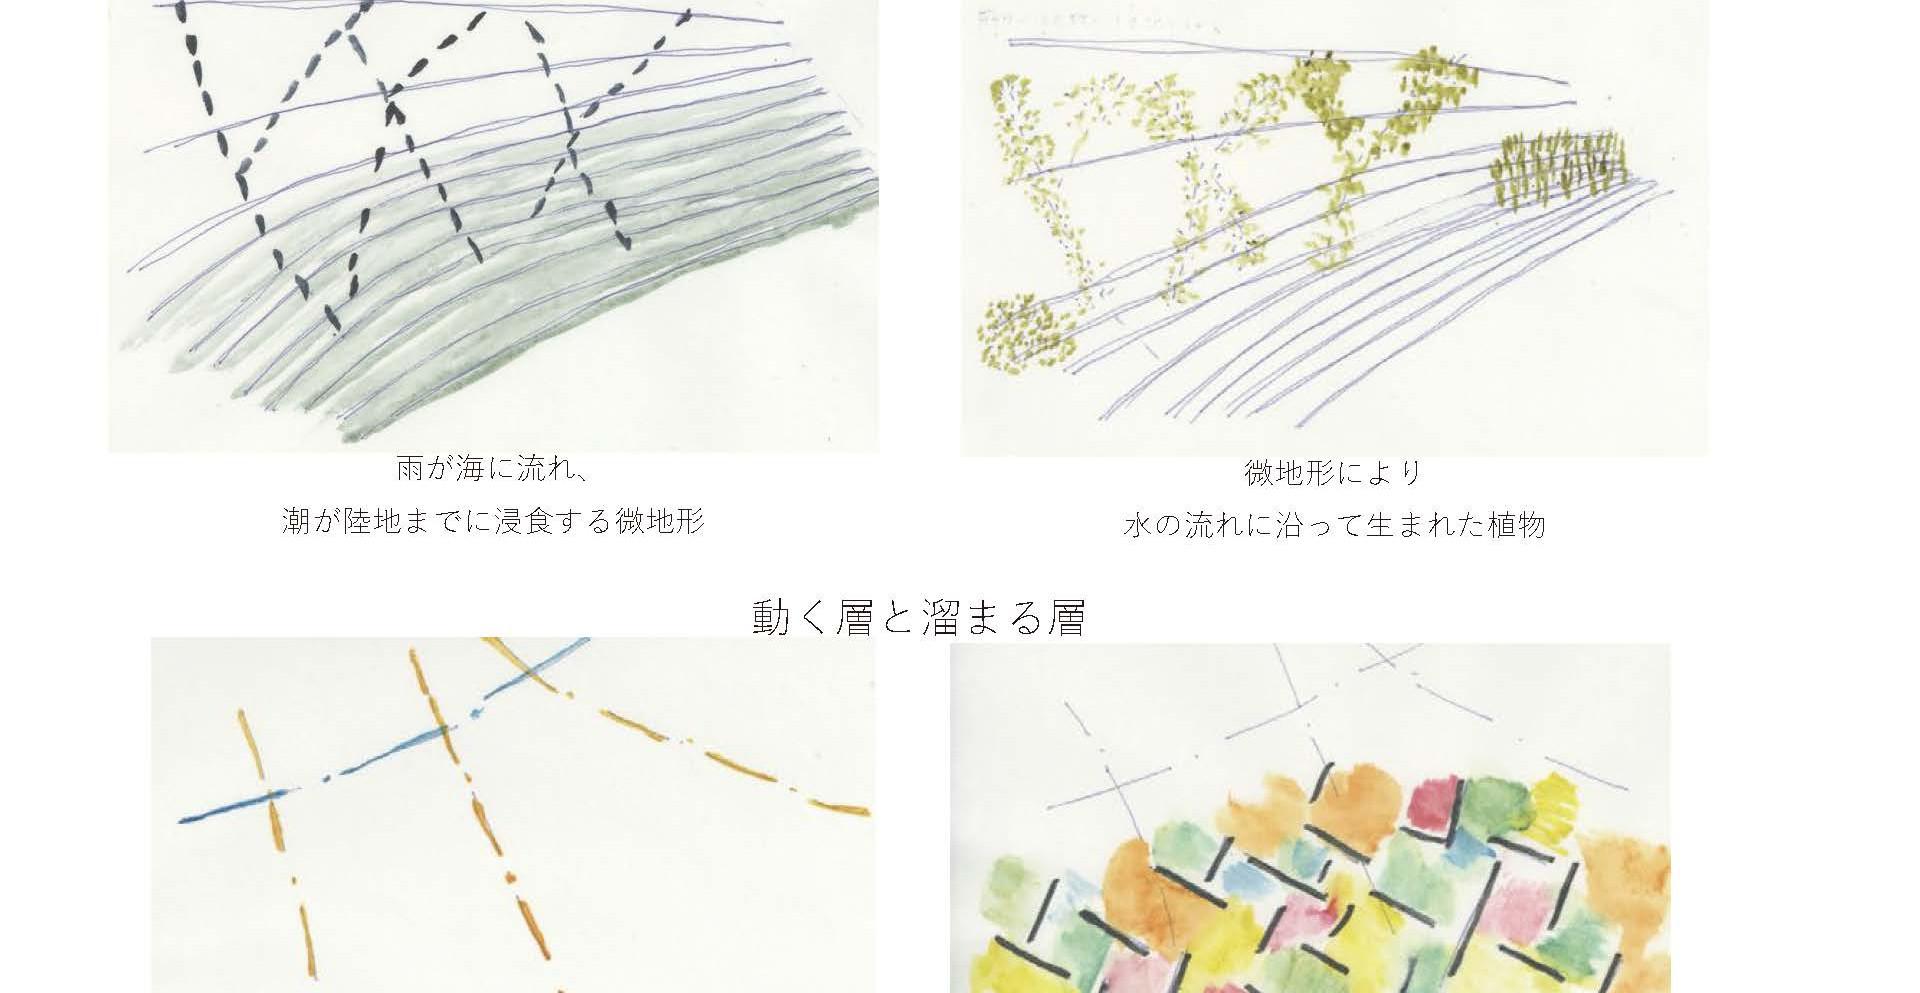 建築展WEB水辺_ページ_07.jpg